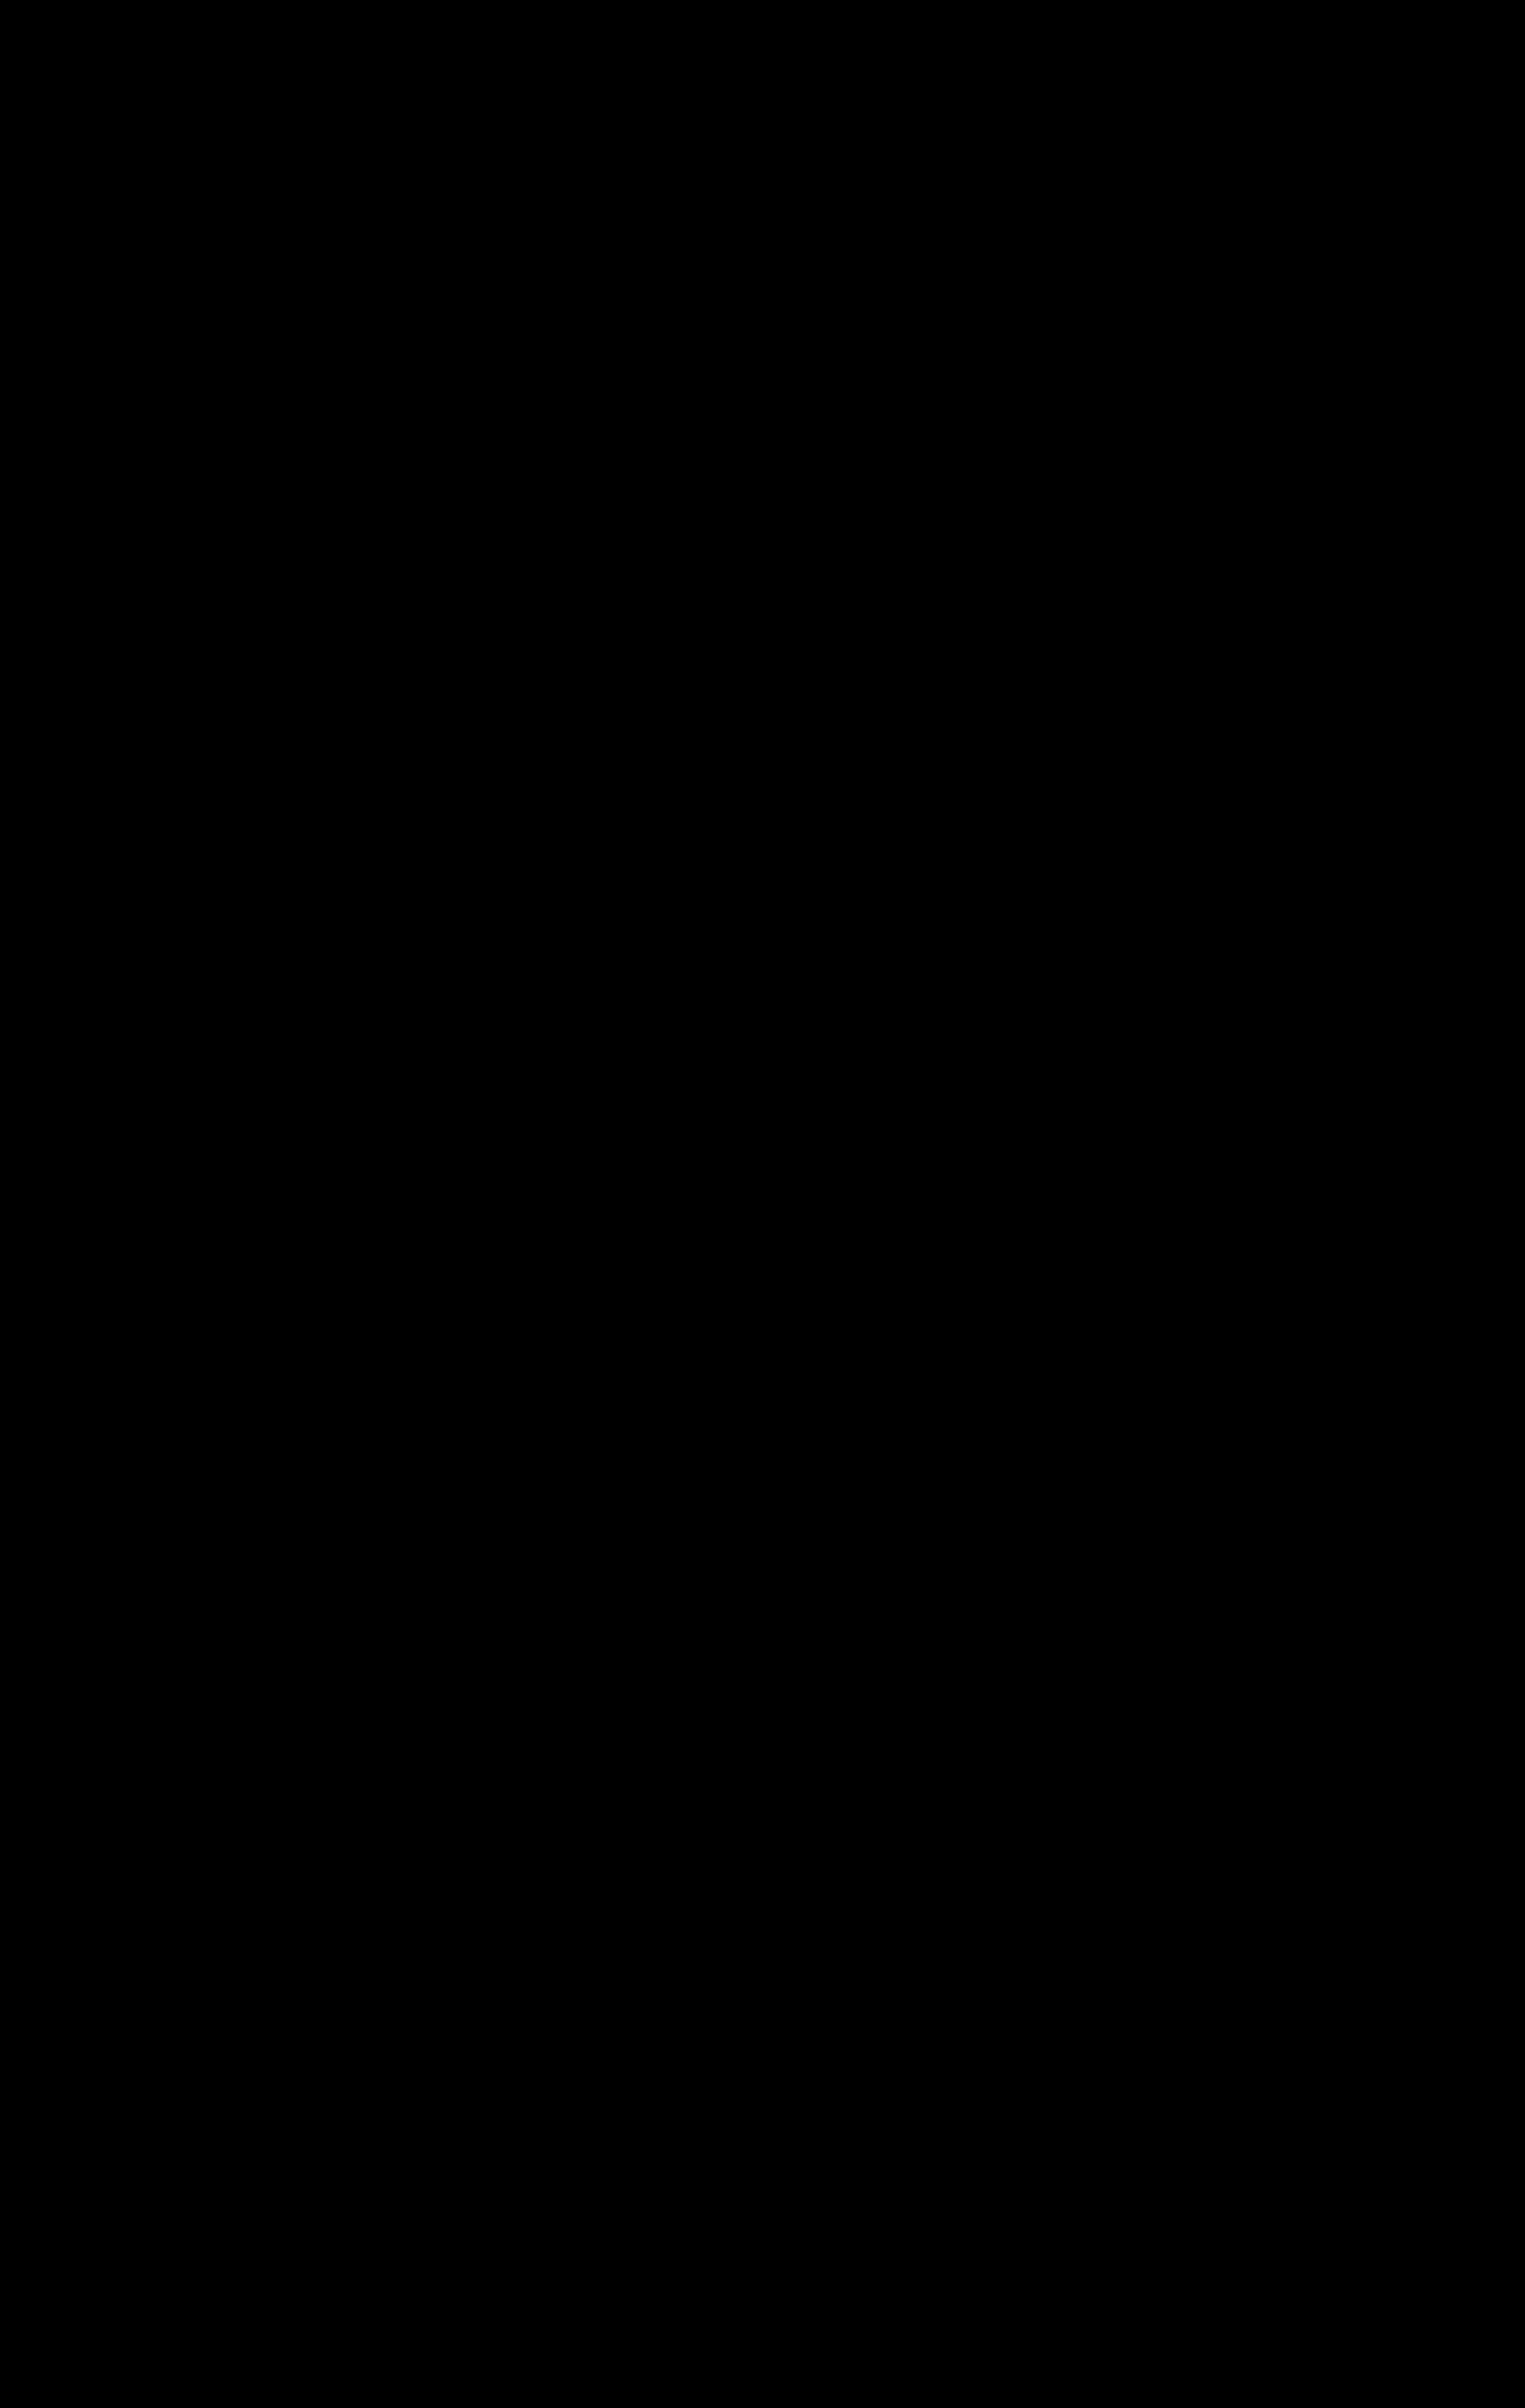 6 Grunge Cross (PNG Transparent).